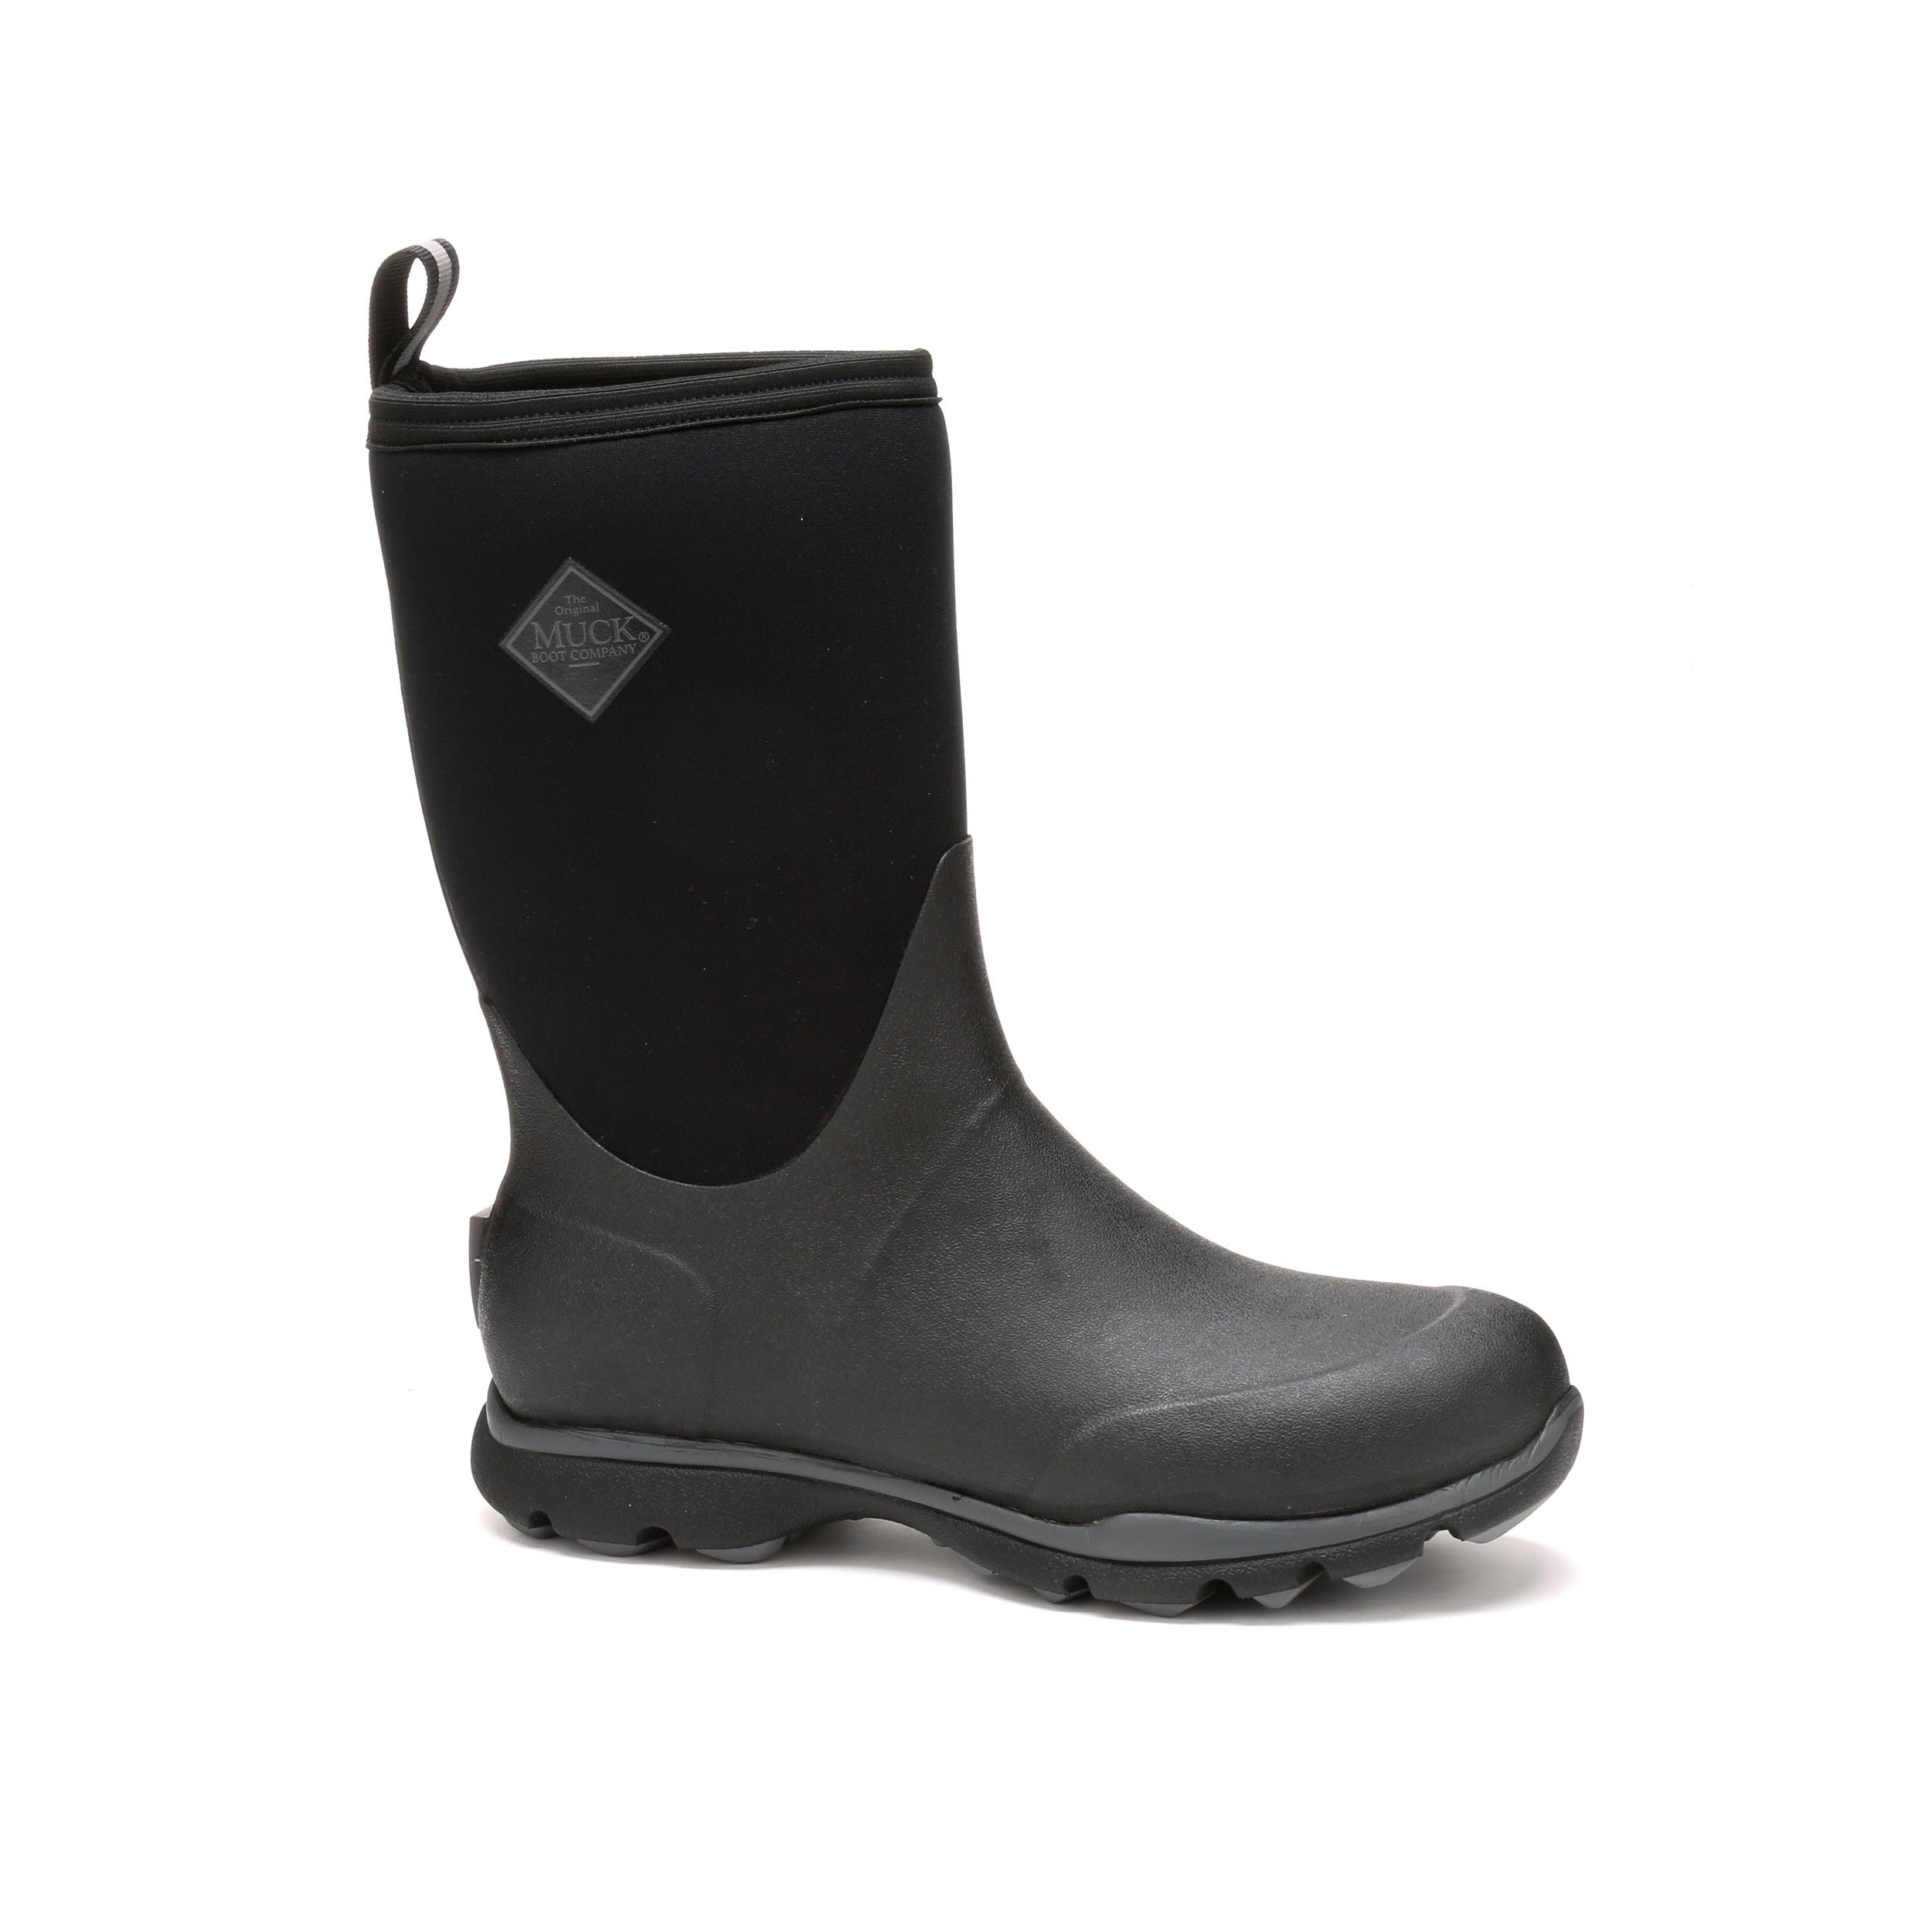 Muck Boot Men's Arctic Excursion Mid Snow Boot, Black/Gray, 9 M US